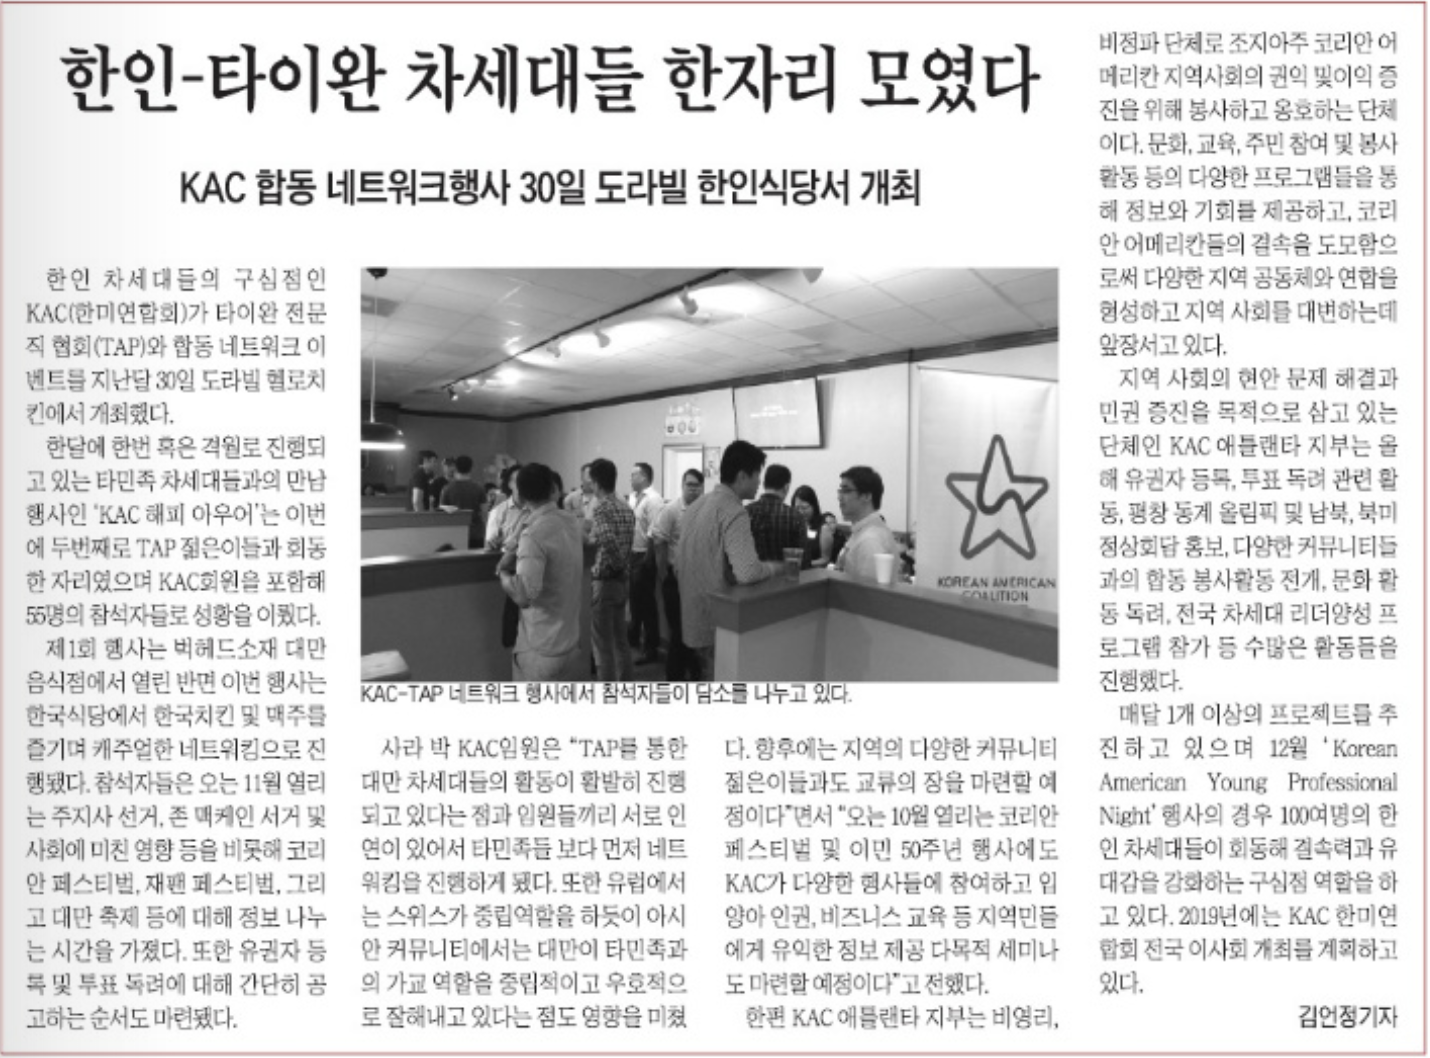 KAC Feature in Chosun Daily